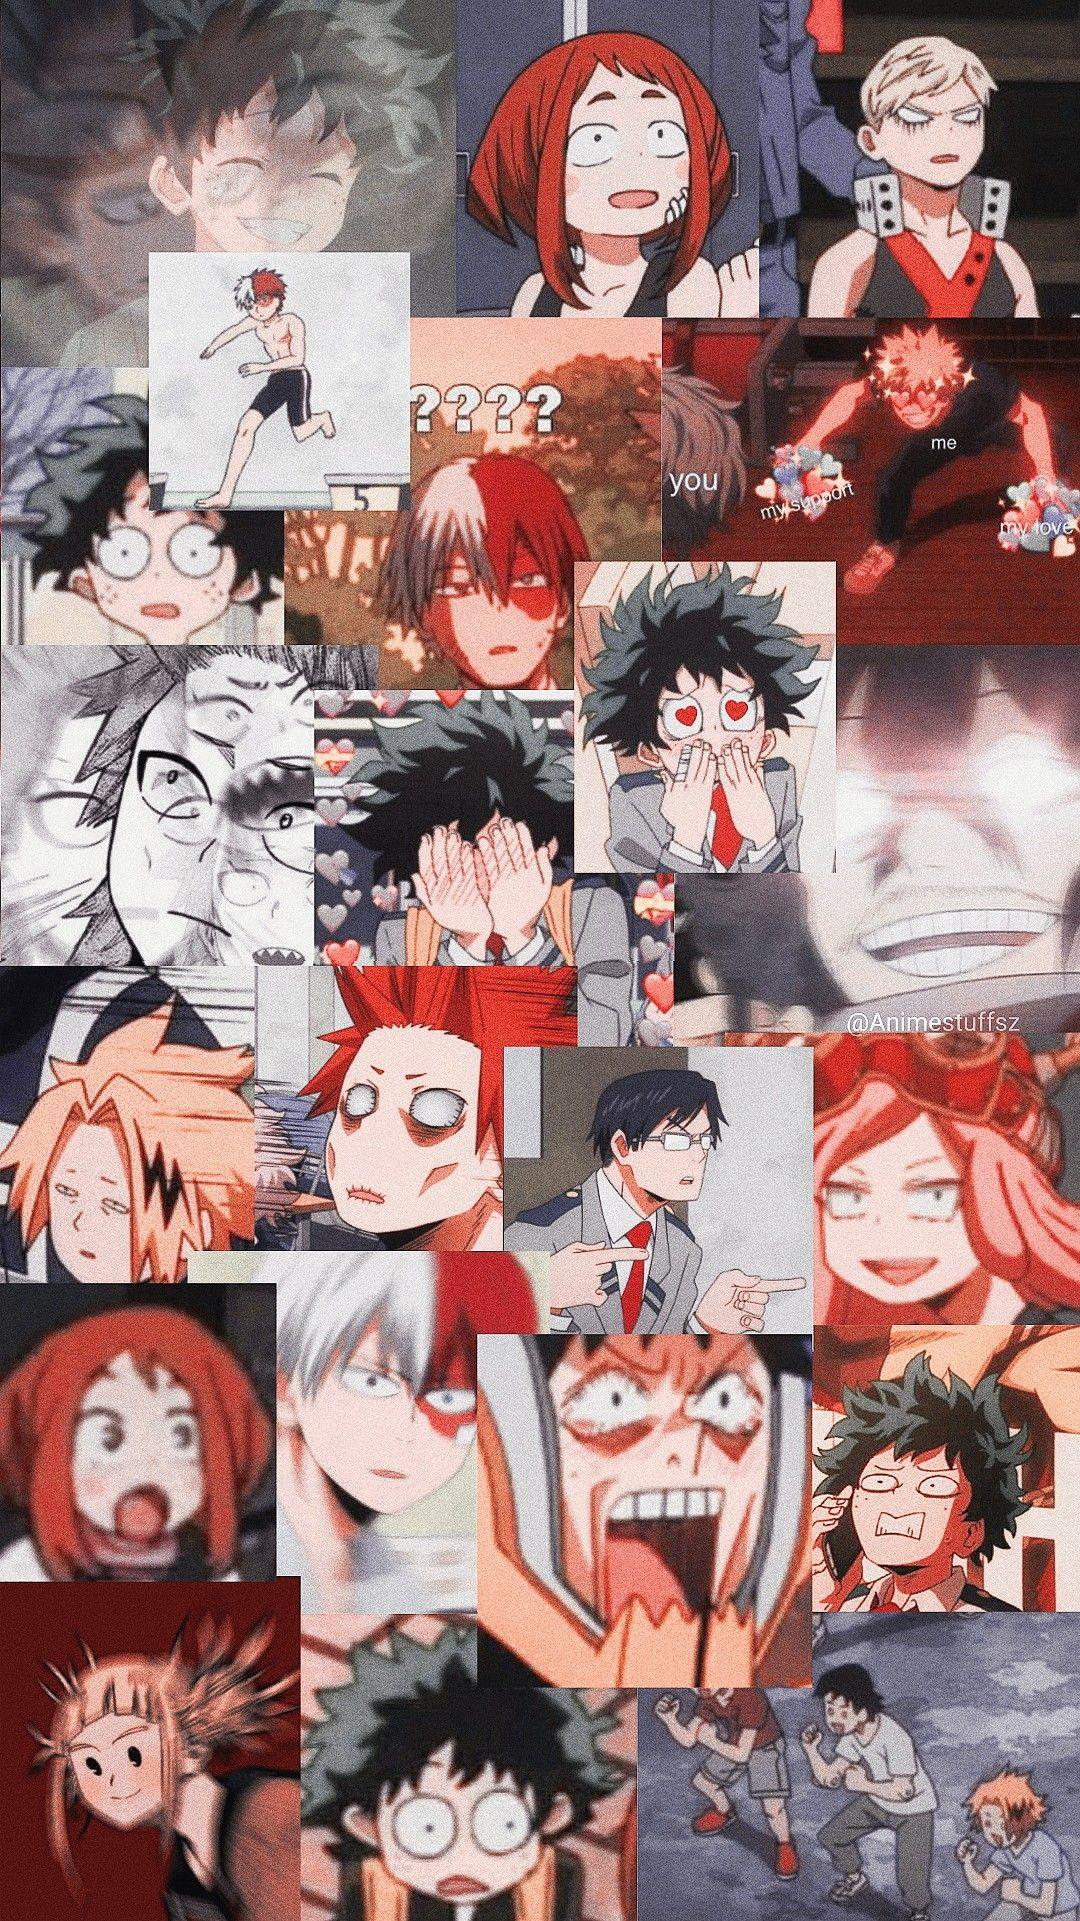 Boku No Hero Academia Anime Wallpaper Iphone Anime Wallpaper Cute Anime Wallpaper